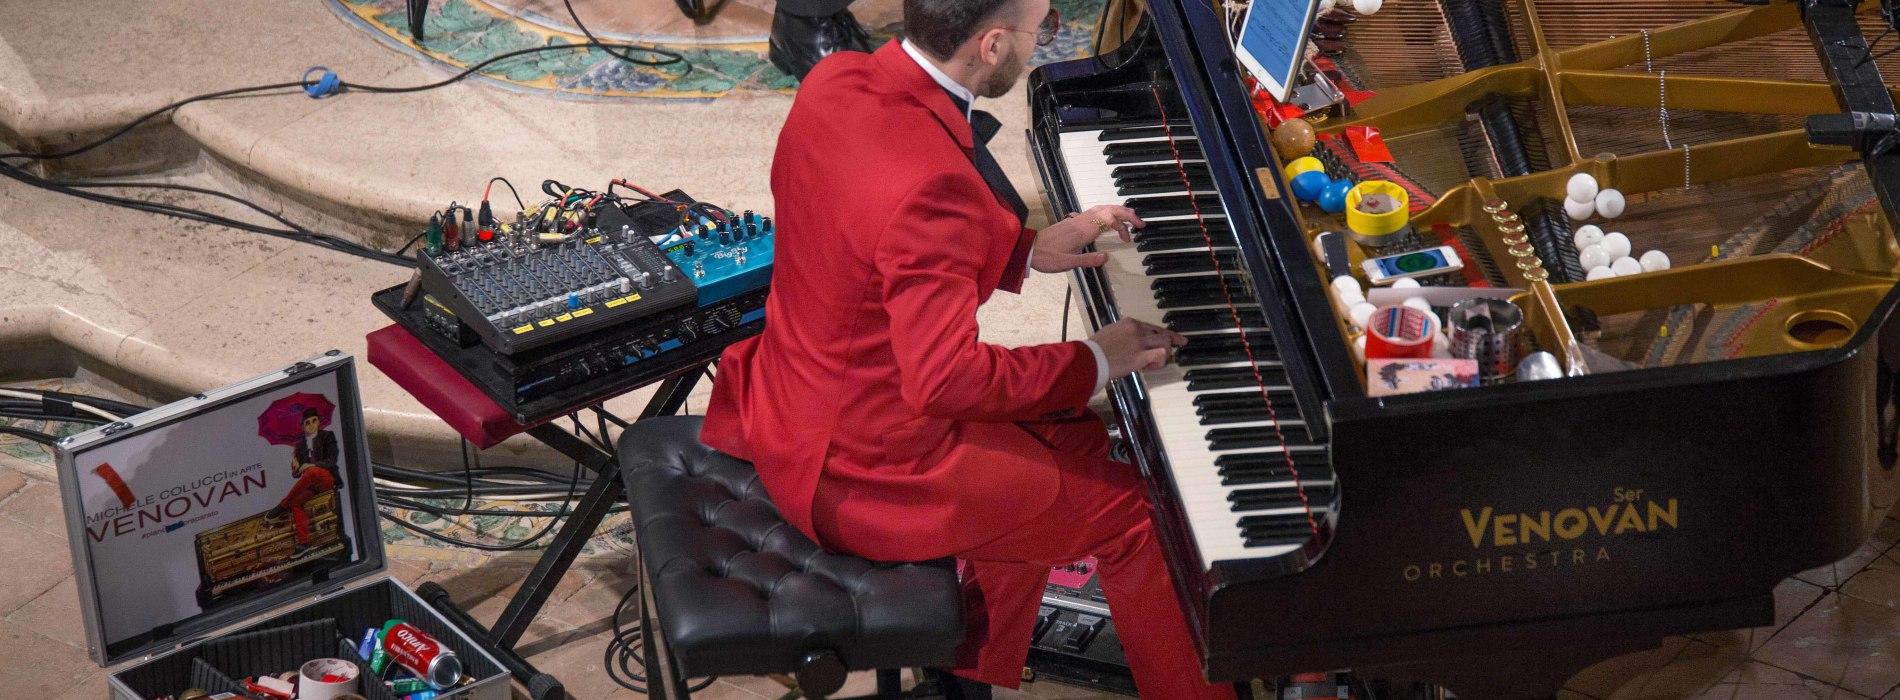 Ser Venovan in concerto per Formicola Borgo DiVino